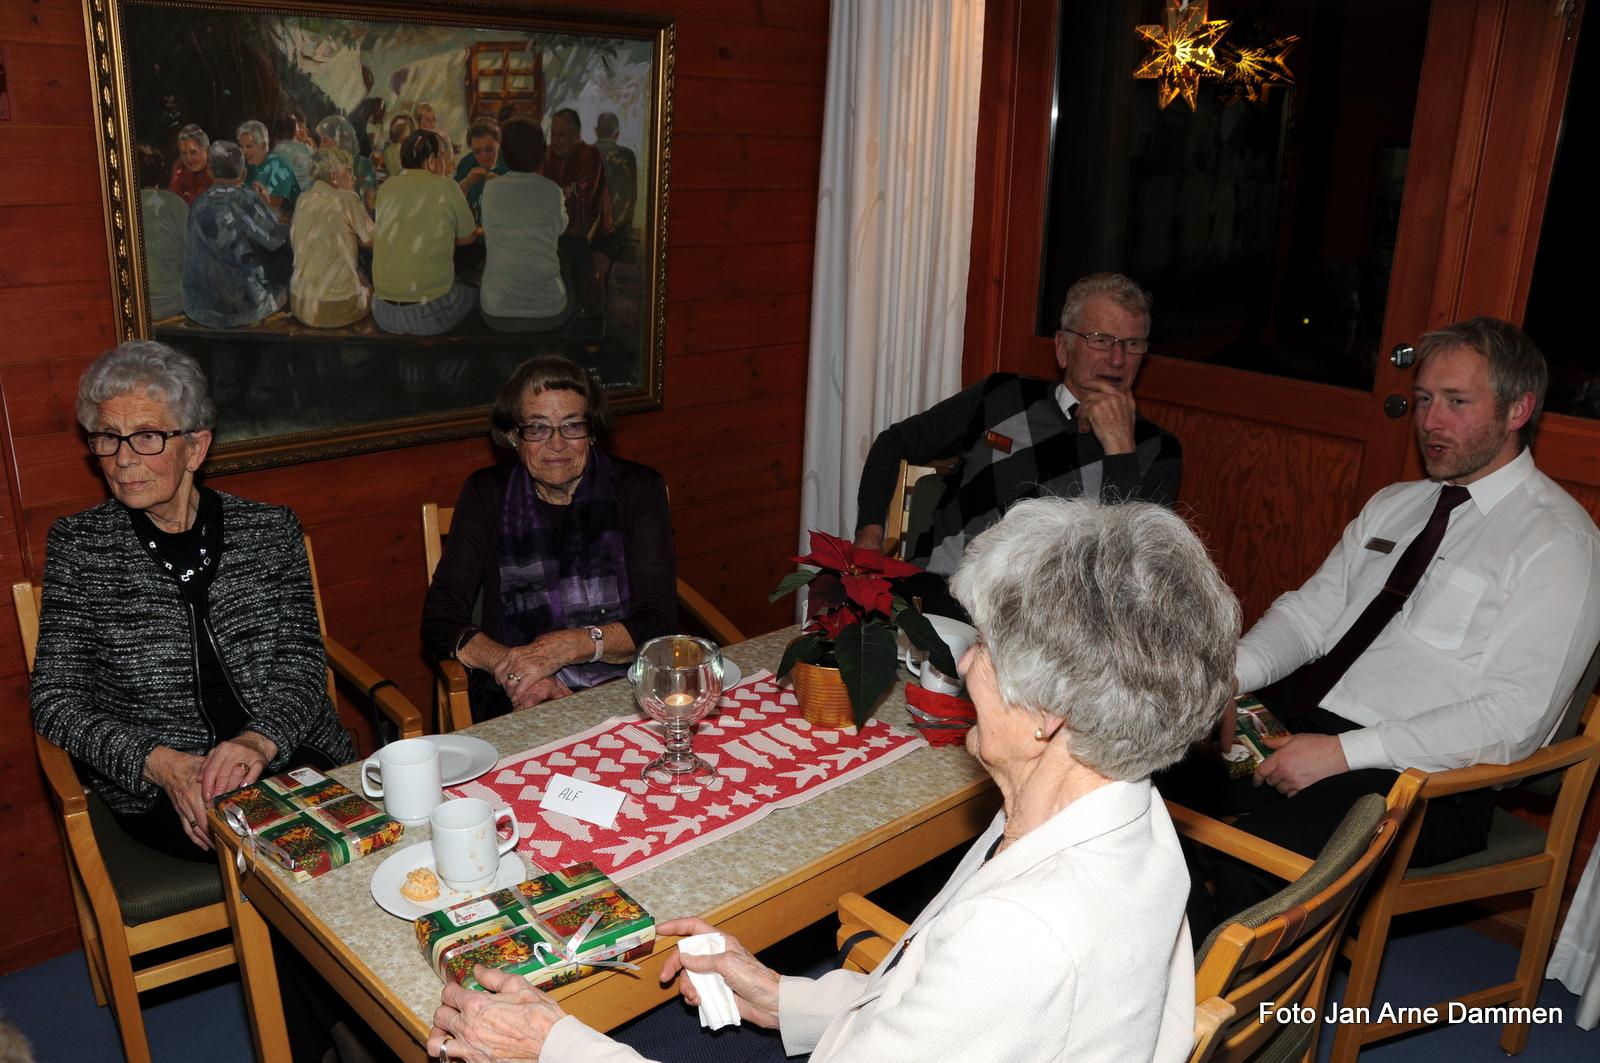 30 års jubileet til A.L.F. Telemark Foto Jan Arne Dammen (7)